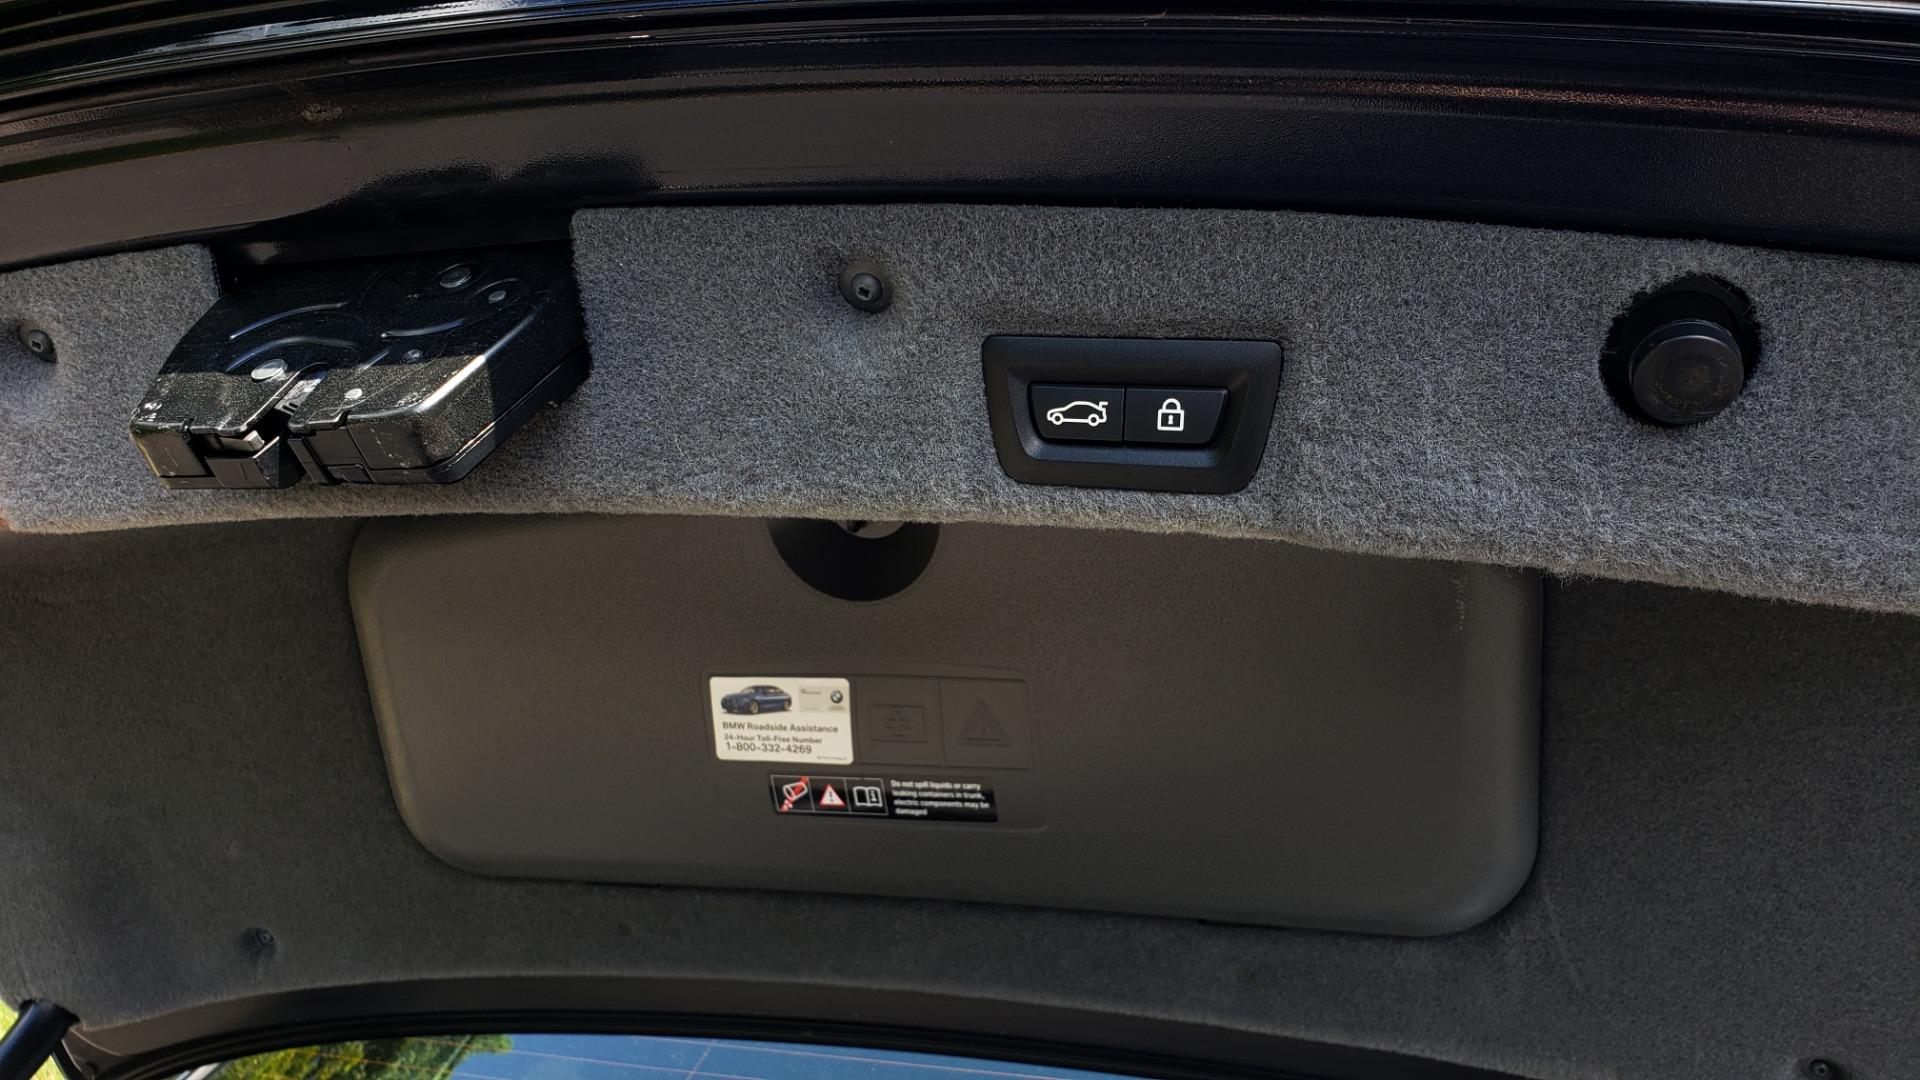 Used 2014 BMW 7 SERIES 750LI M-SPORT / EXEC PKG / DRVR ASST / LIGHTING / NAV / SUNROOF for sale Sold at Formula Imports in Charlotte NC 28227 15